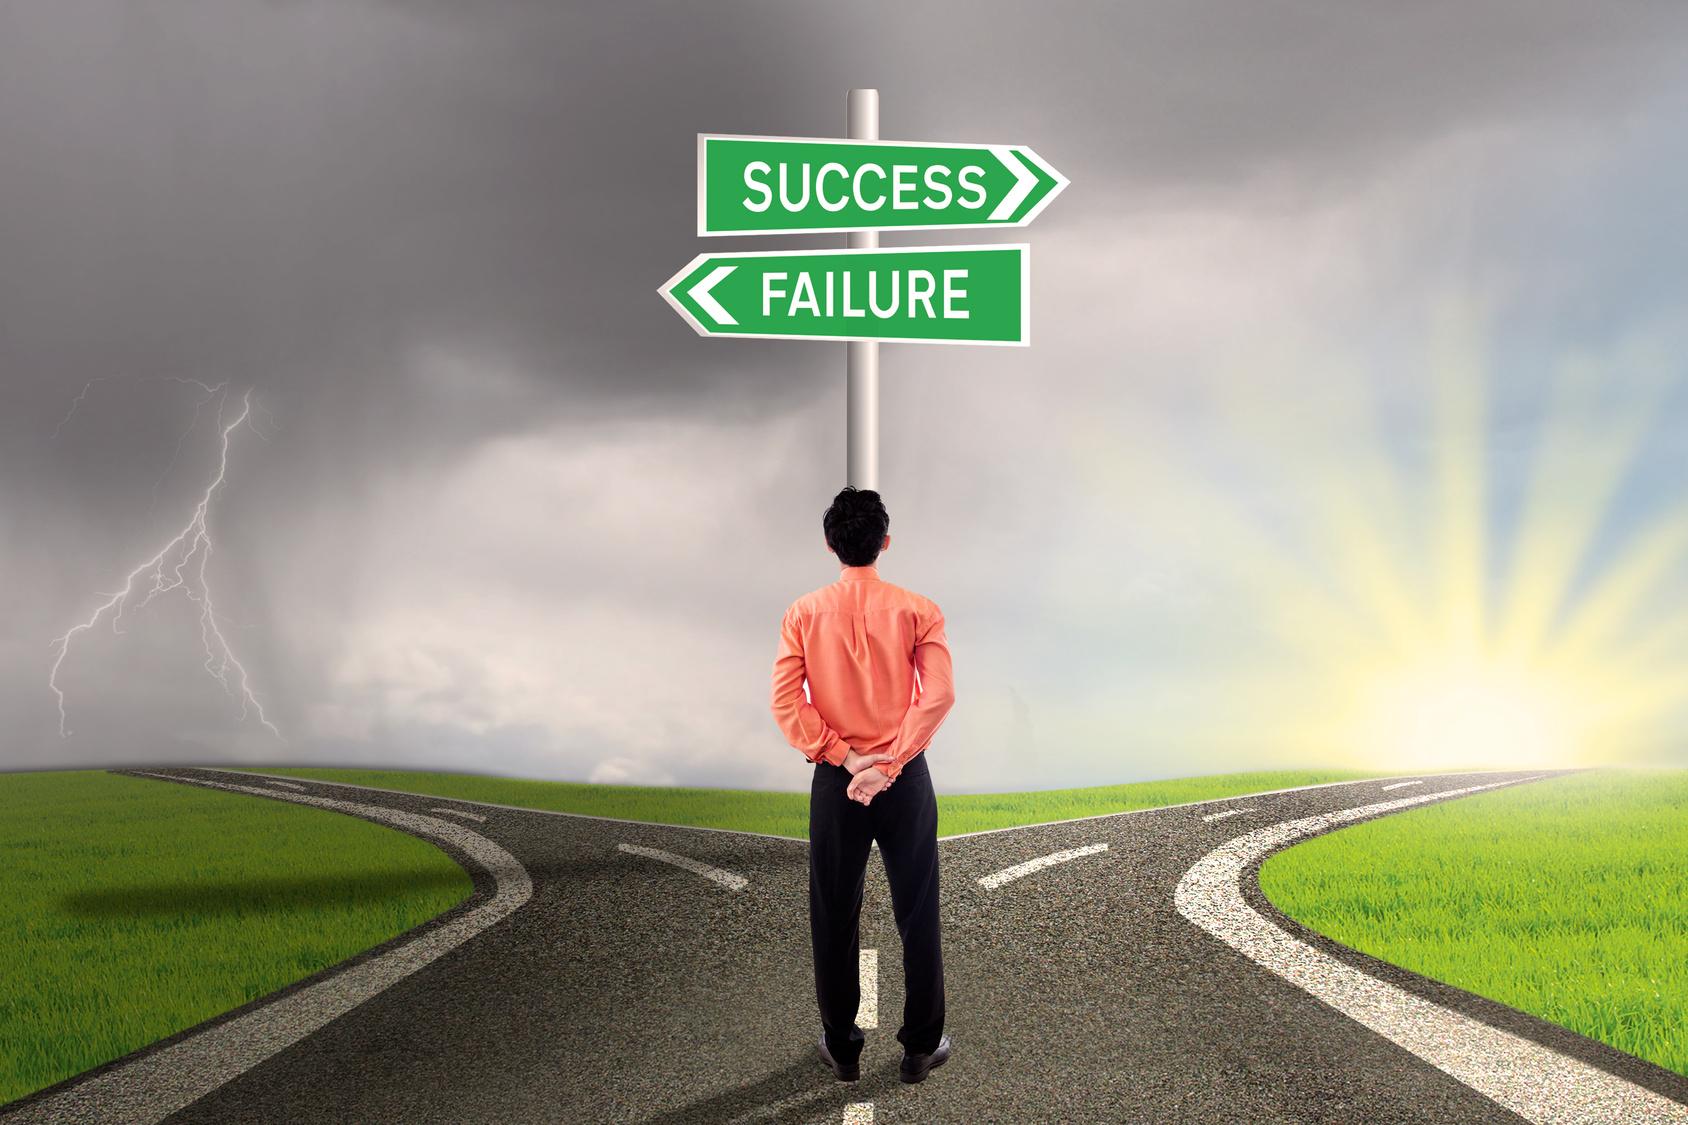 success_failure_choose_roads-1